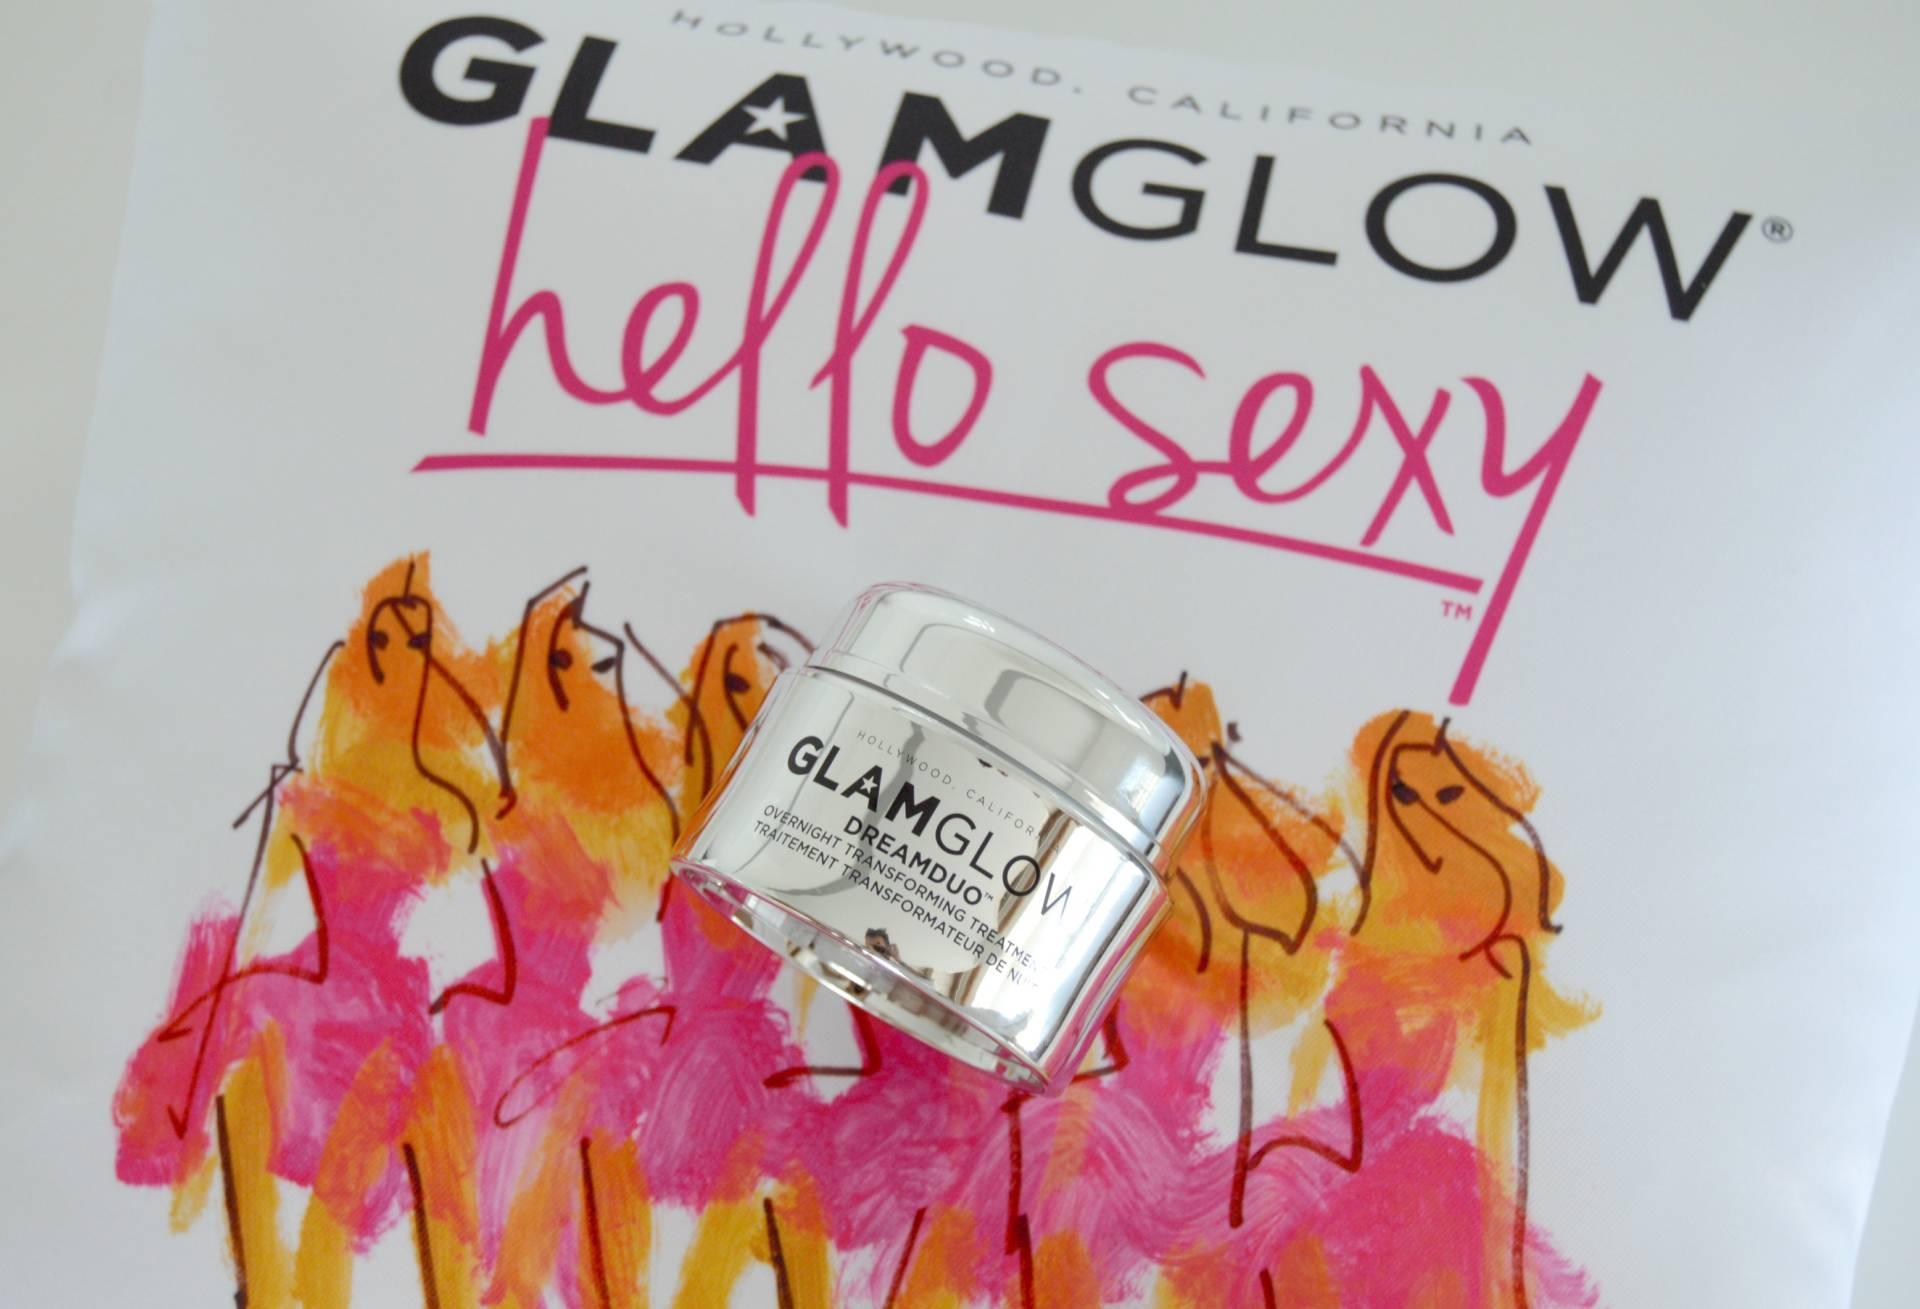 glamglow-dreamduo-hello-sexy-review-inhautepursuit